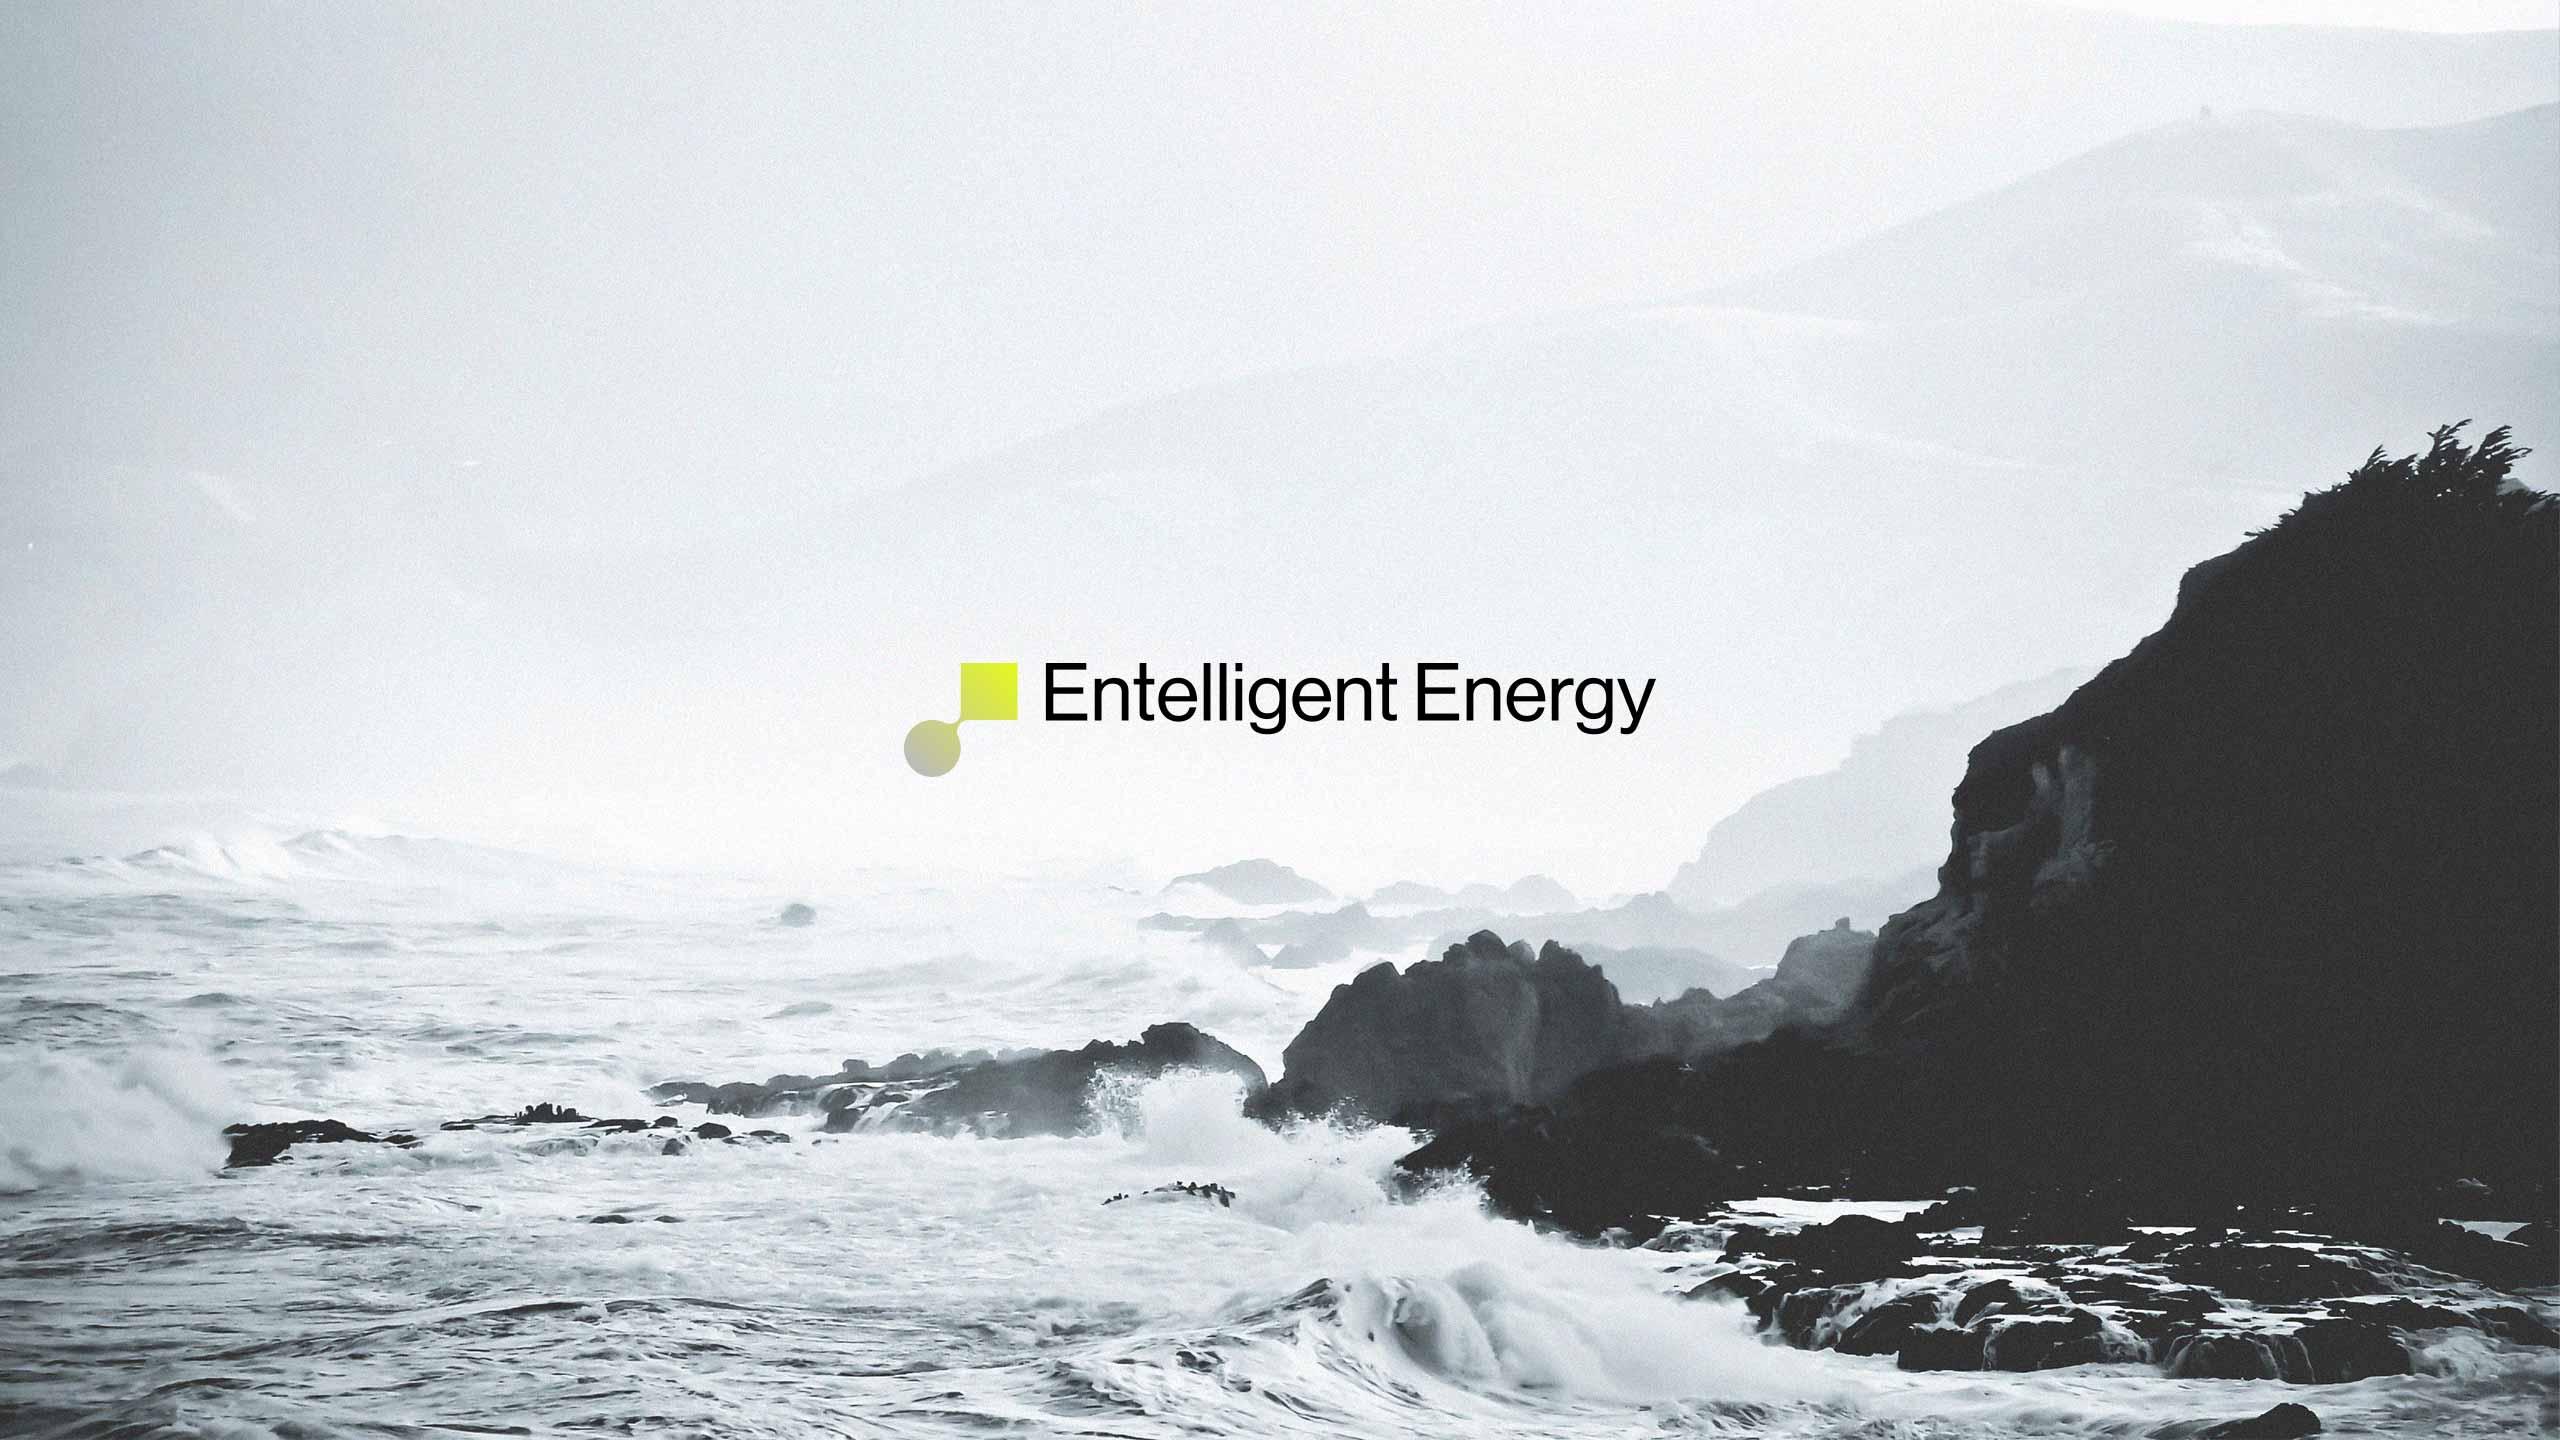 Entelligent-Energy-07b